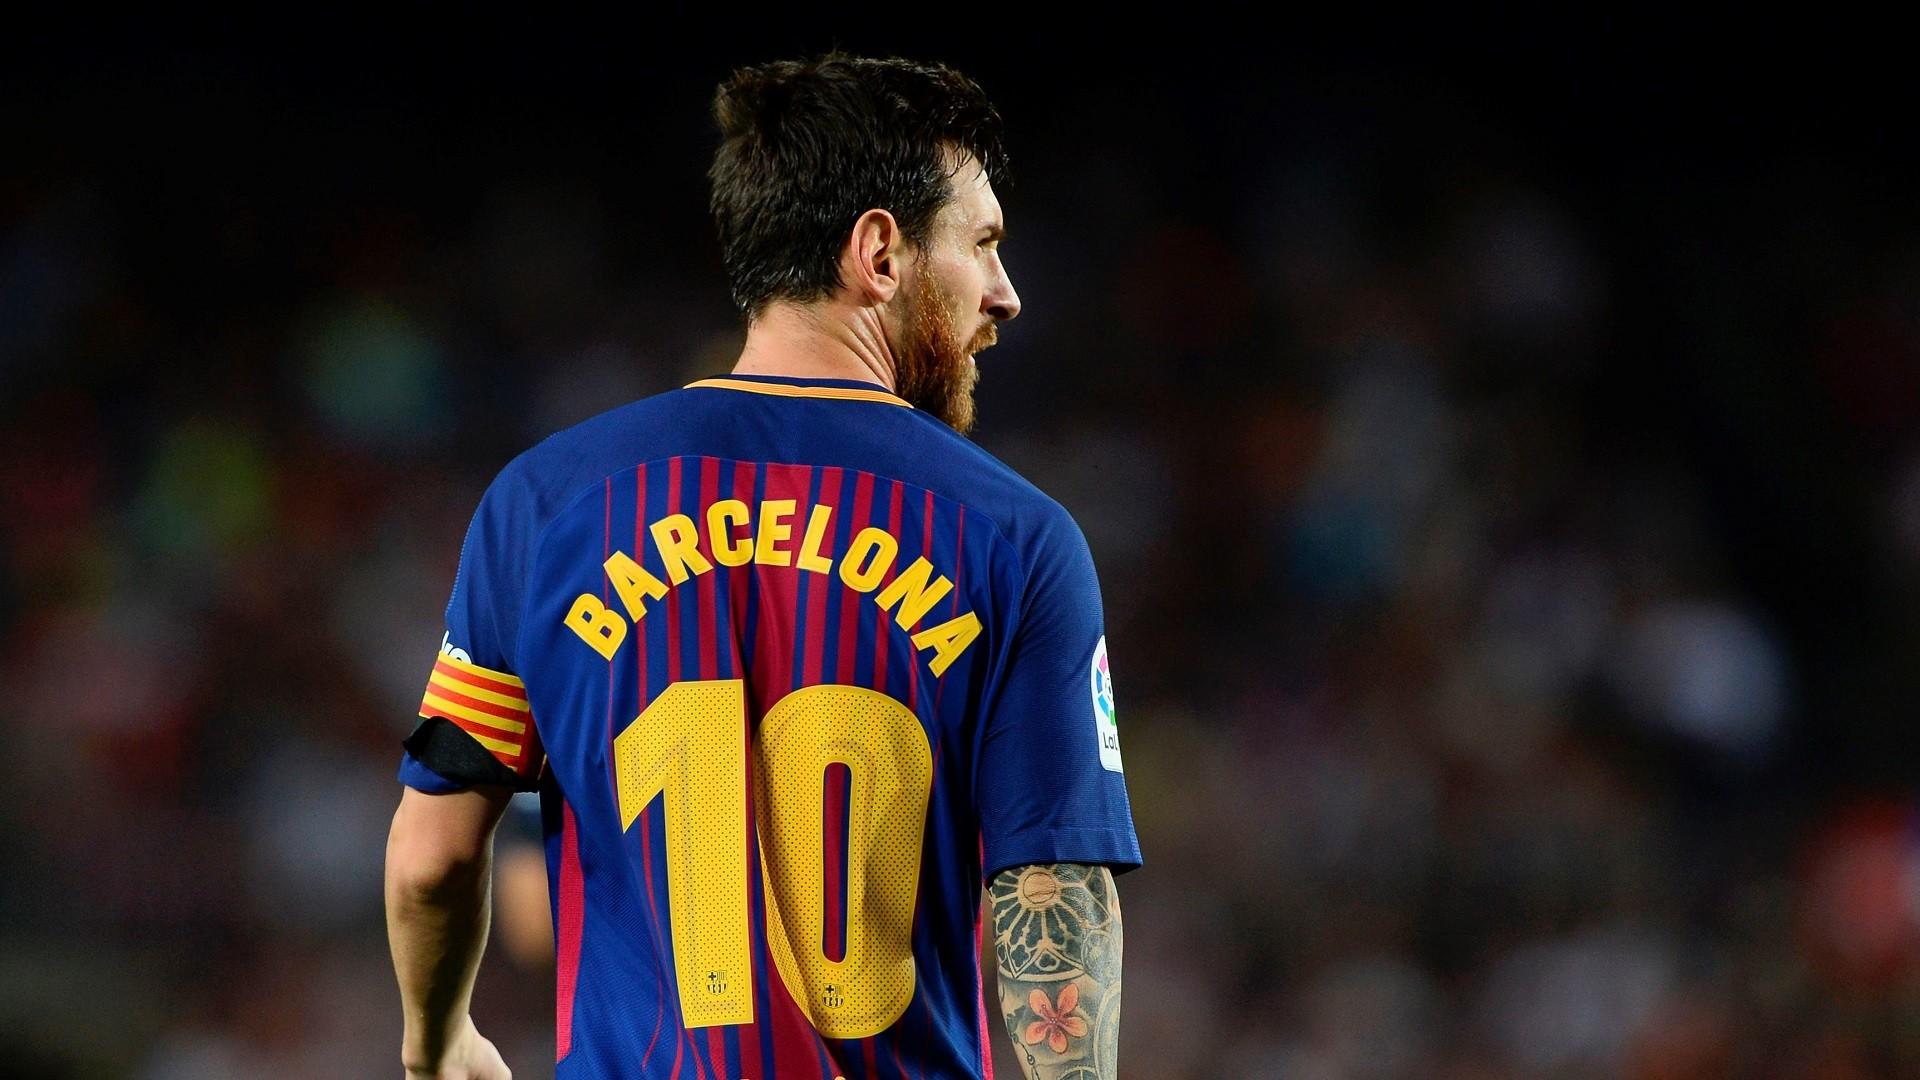 2800x1874 The 25 Best Messi Wallpaper 2017 Ideas On Pinterest